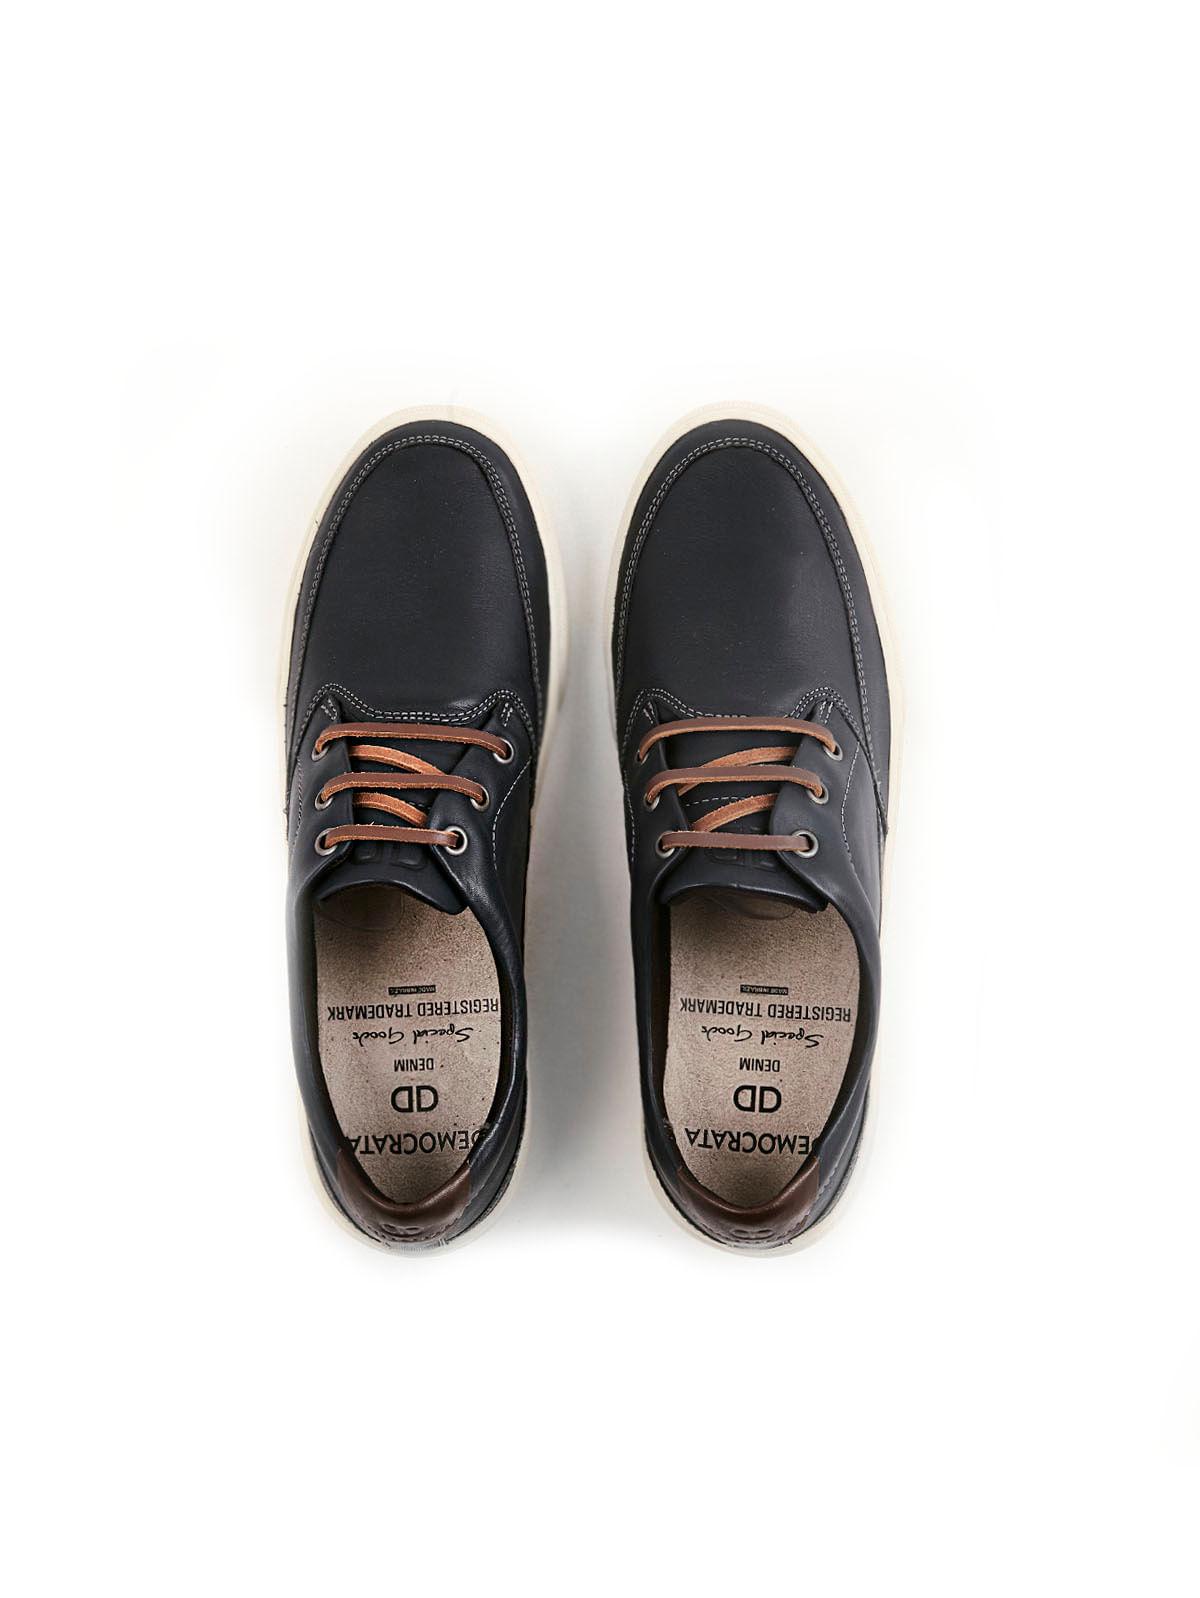 Zapato Casual de Cuero Estilo Vintage 66201 - Arturo Calle 5f1b7e3868501